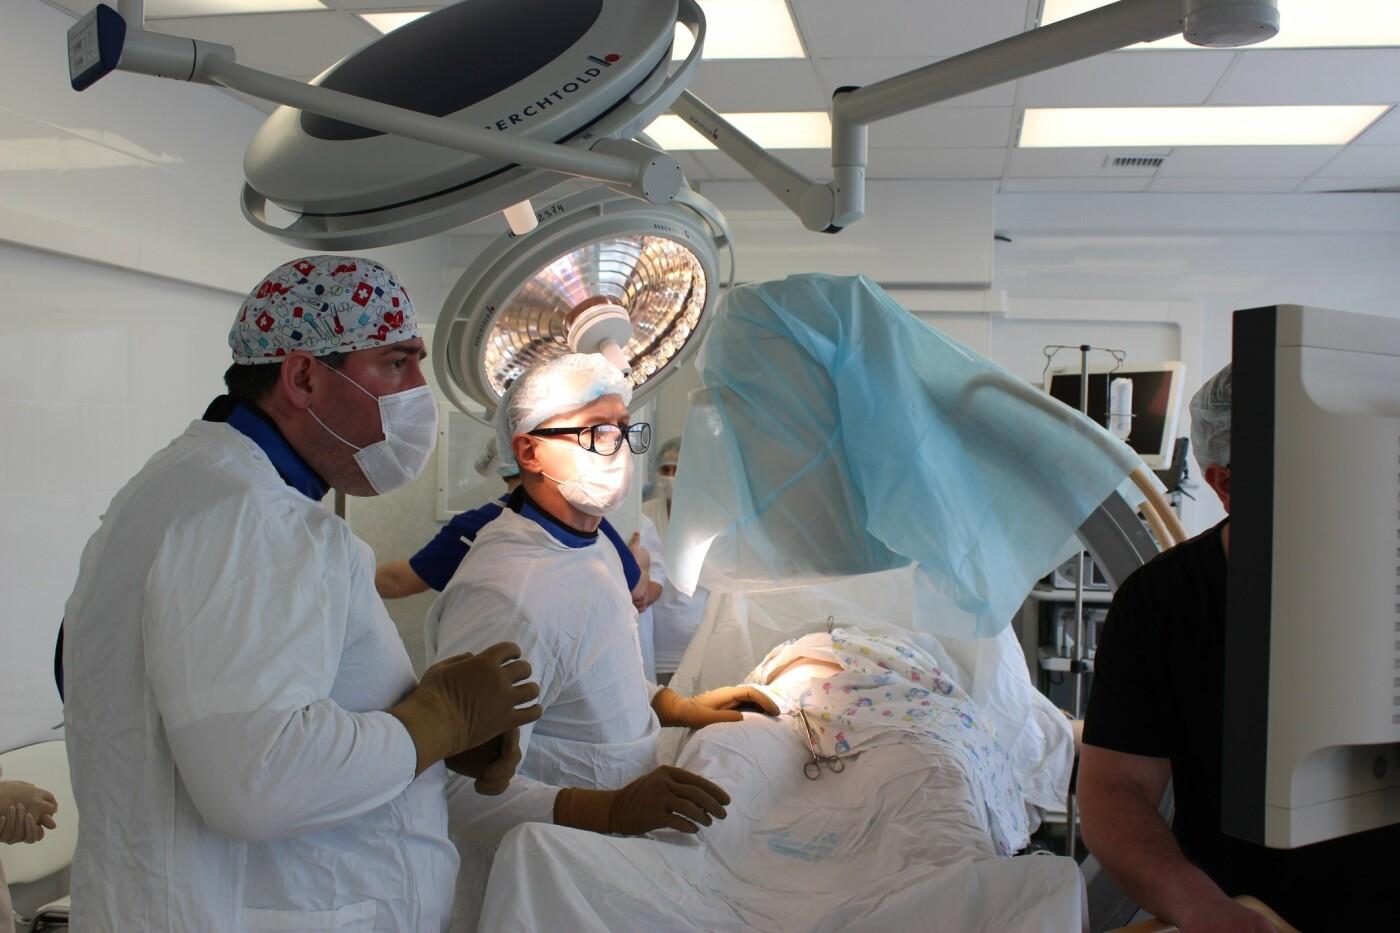 Димитровградские хирурги сохранили здоровье мужчине, тяжело травмированному в ДТП, фото-2